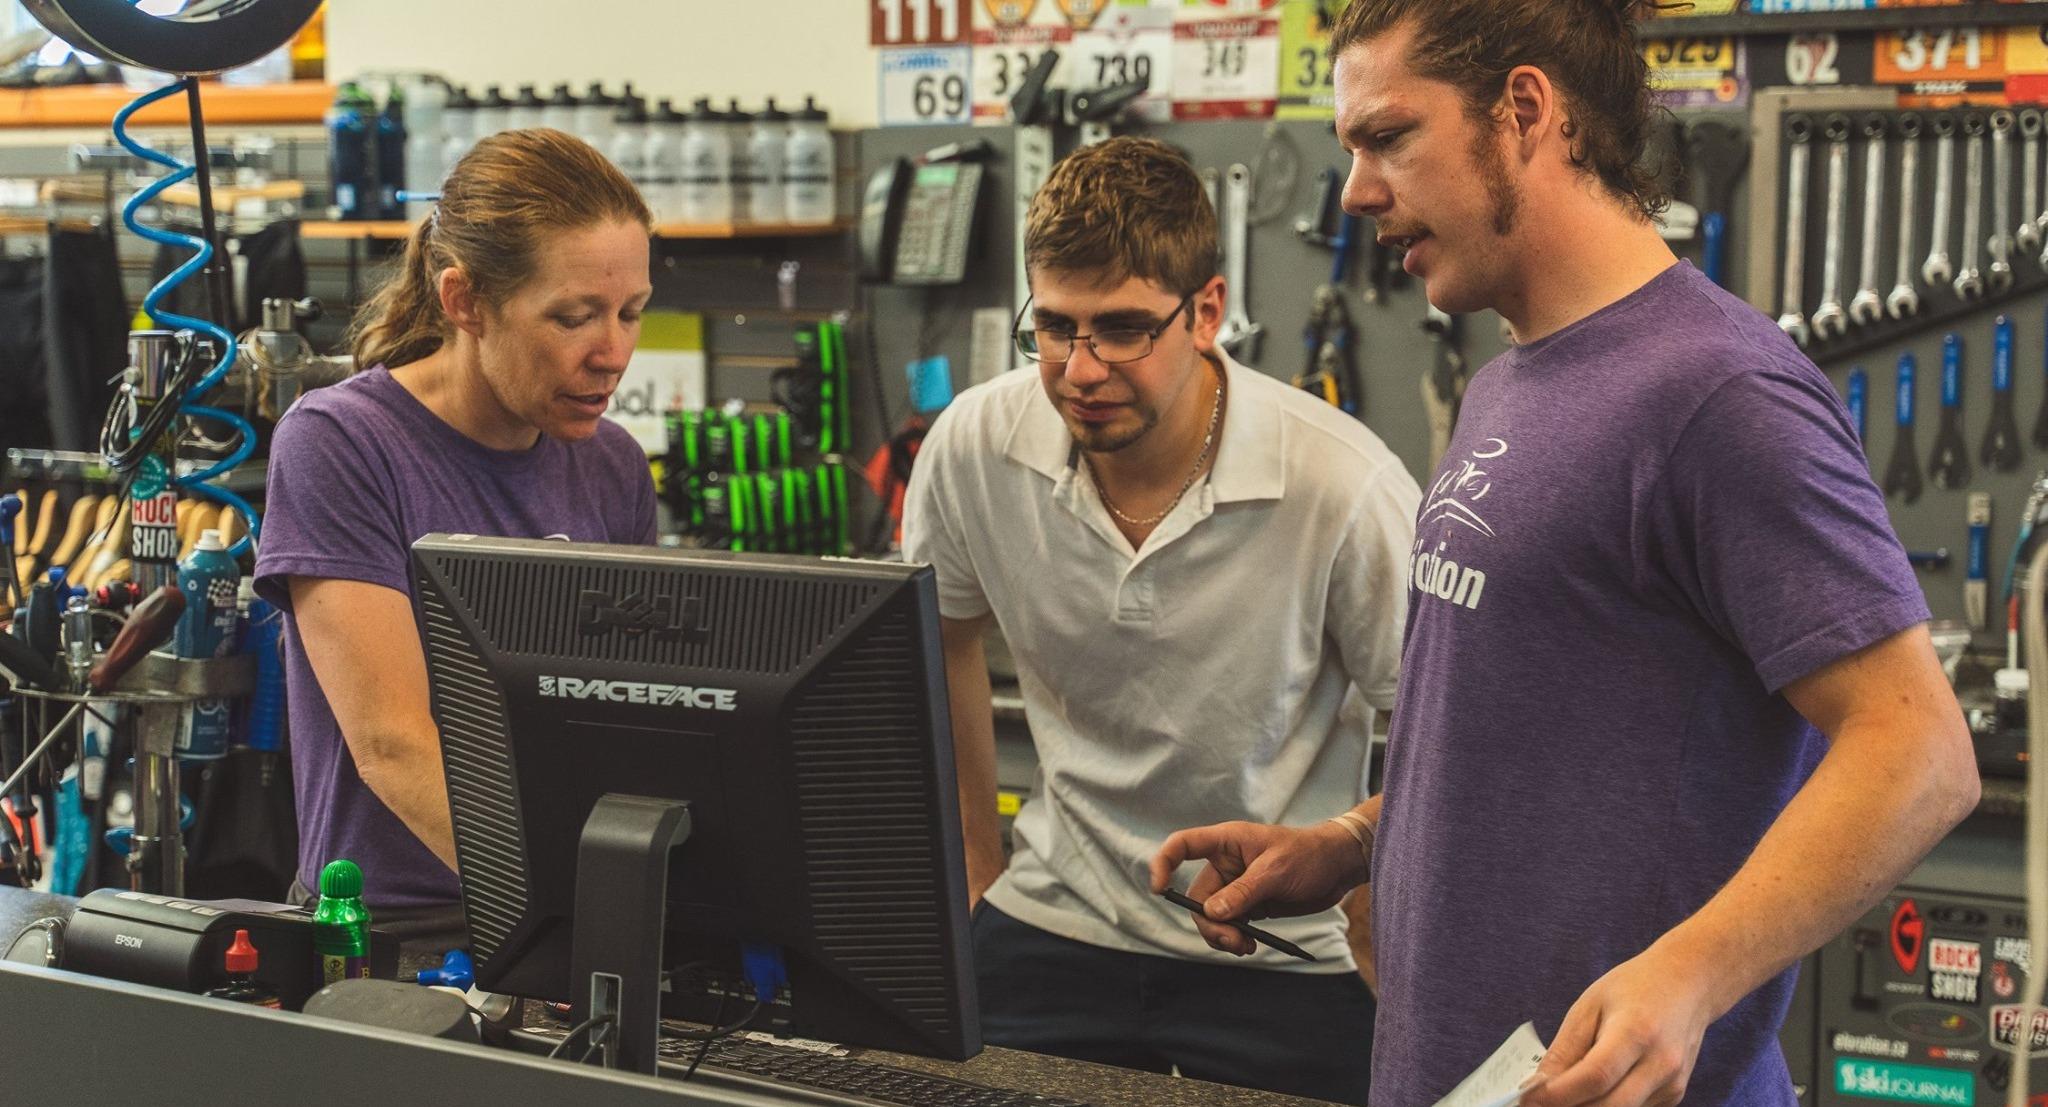 Three employees around a computer